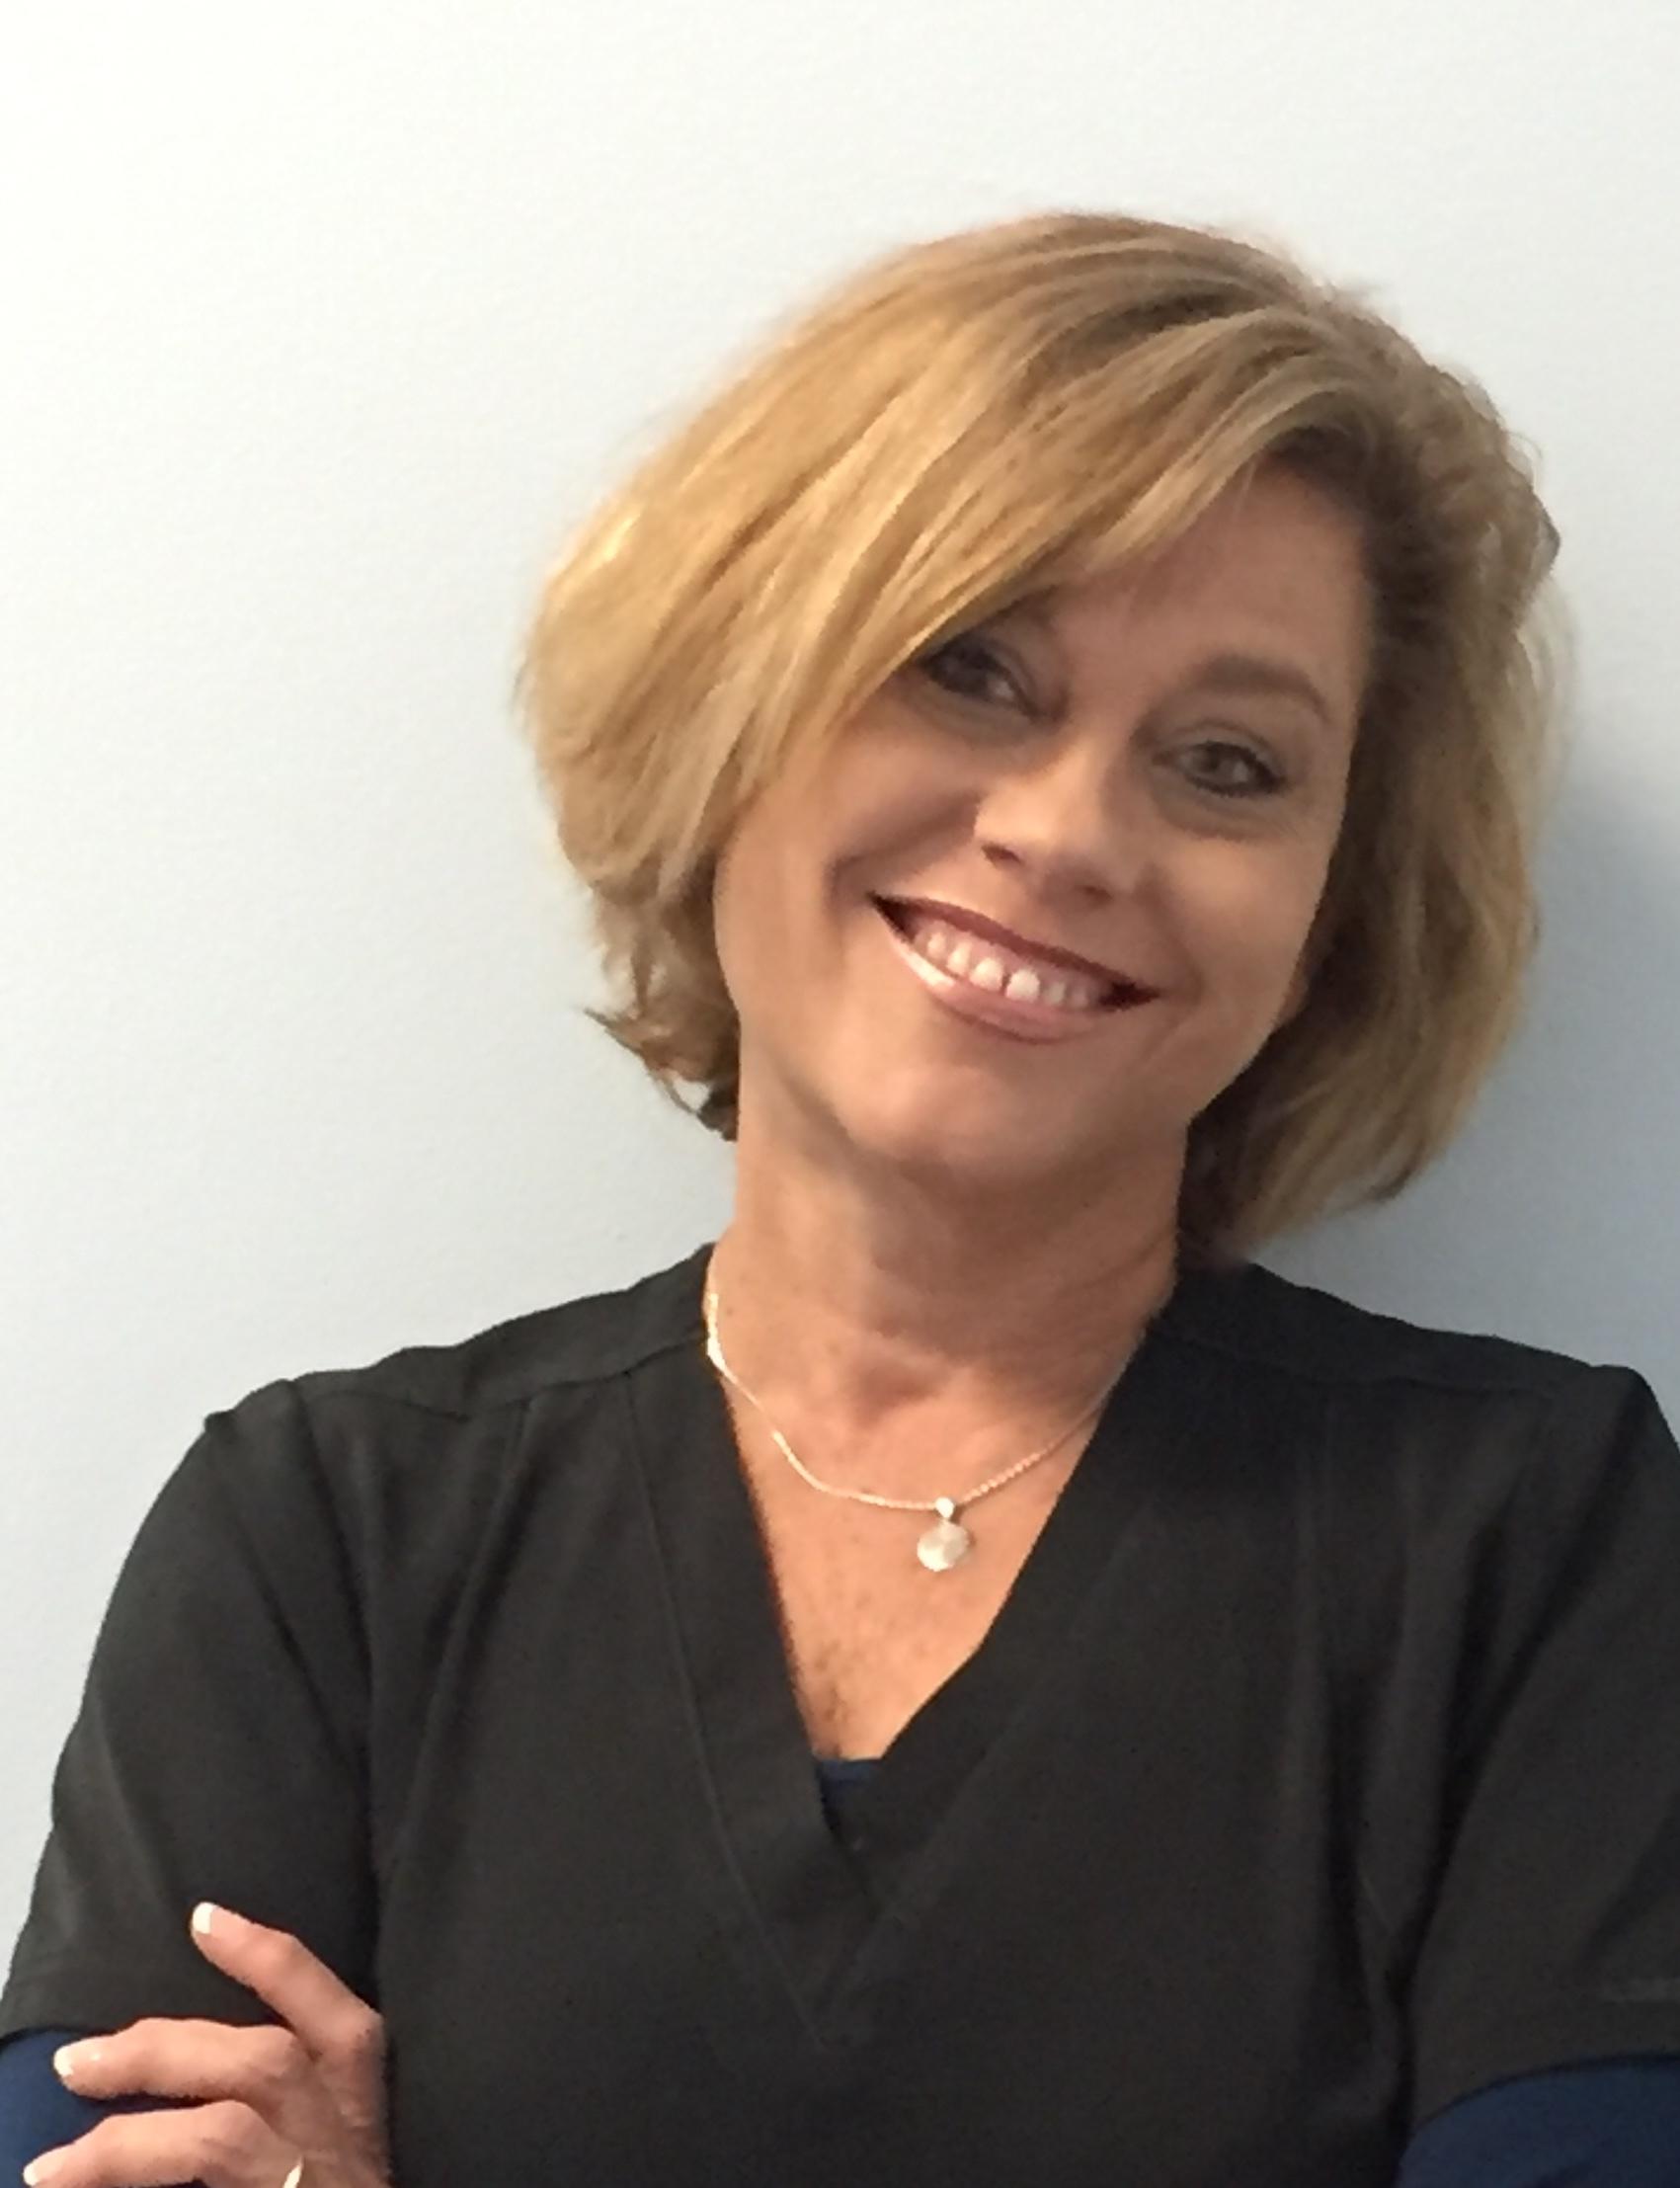 Lauren Honeyman, RN/BSN/CHRN